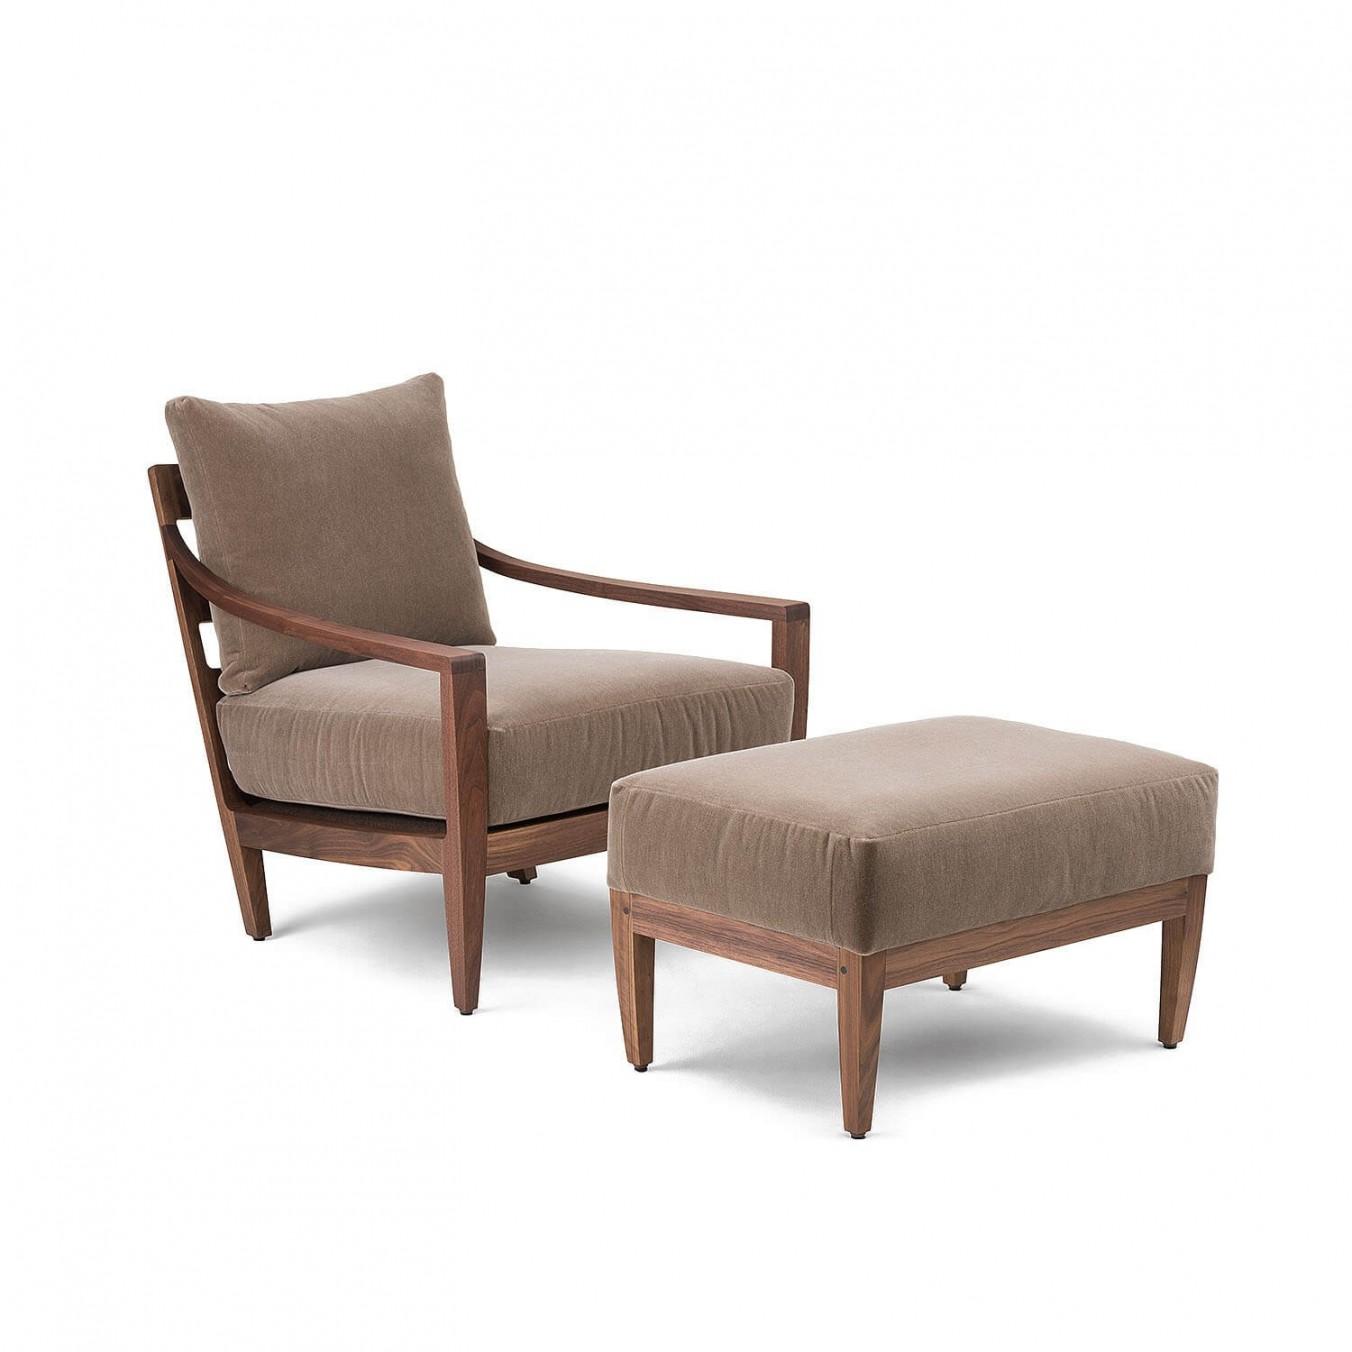 Low Lounge Chair Ottoman Kooku